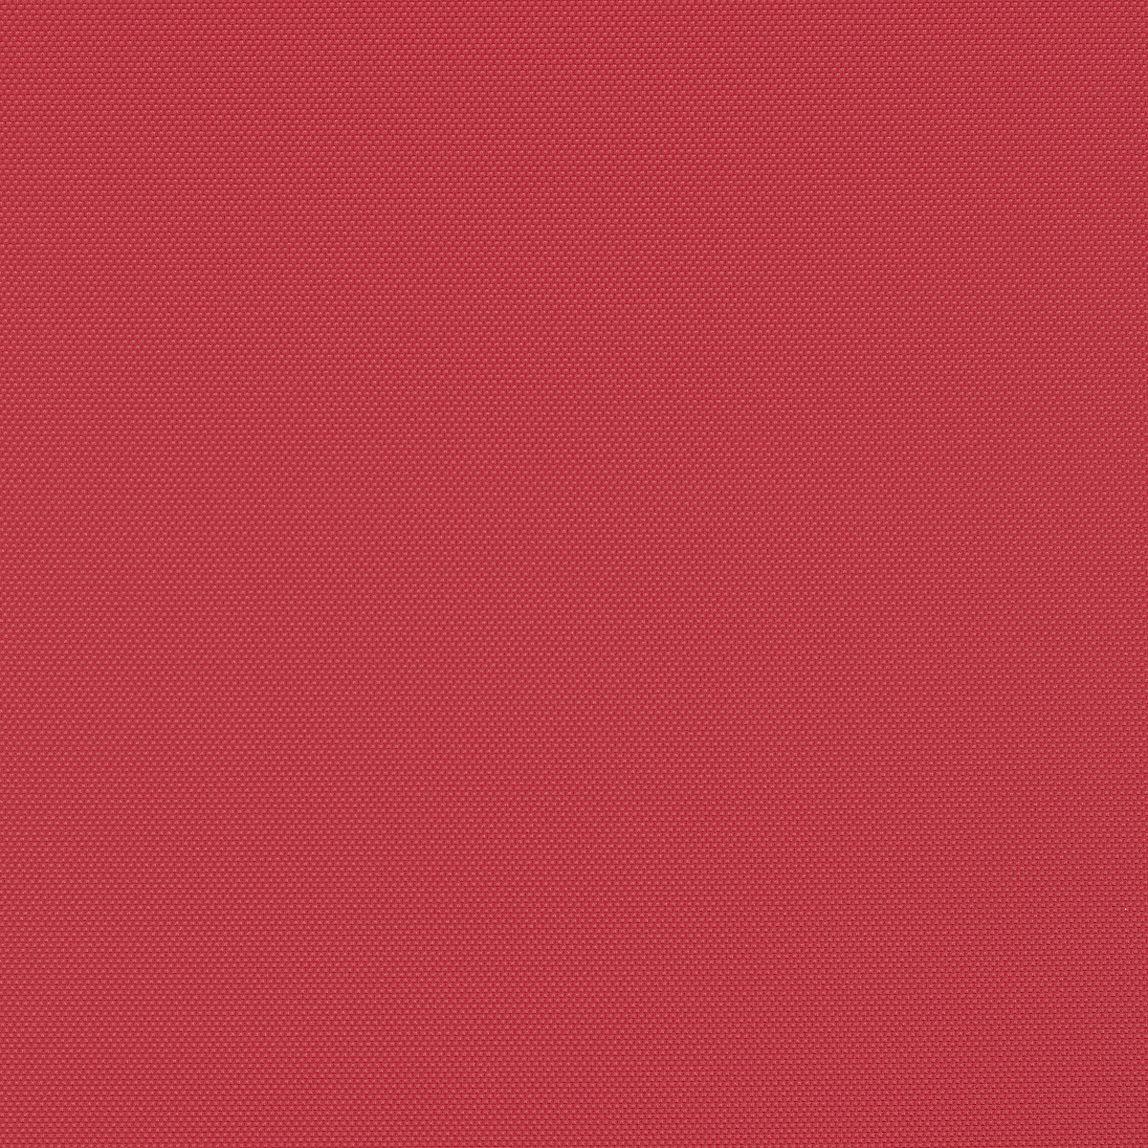 Amplify Scarlet Swatch